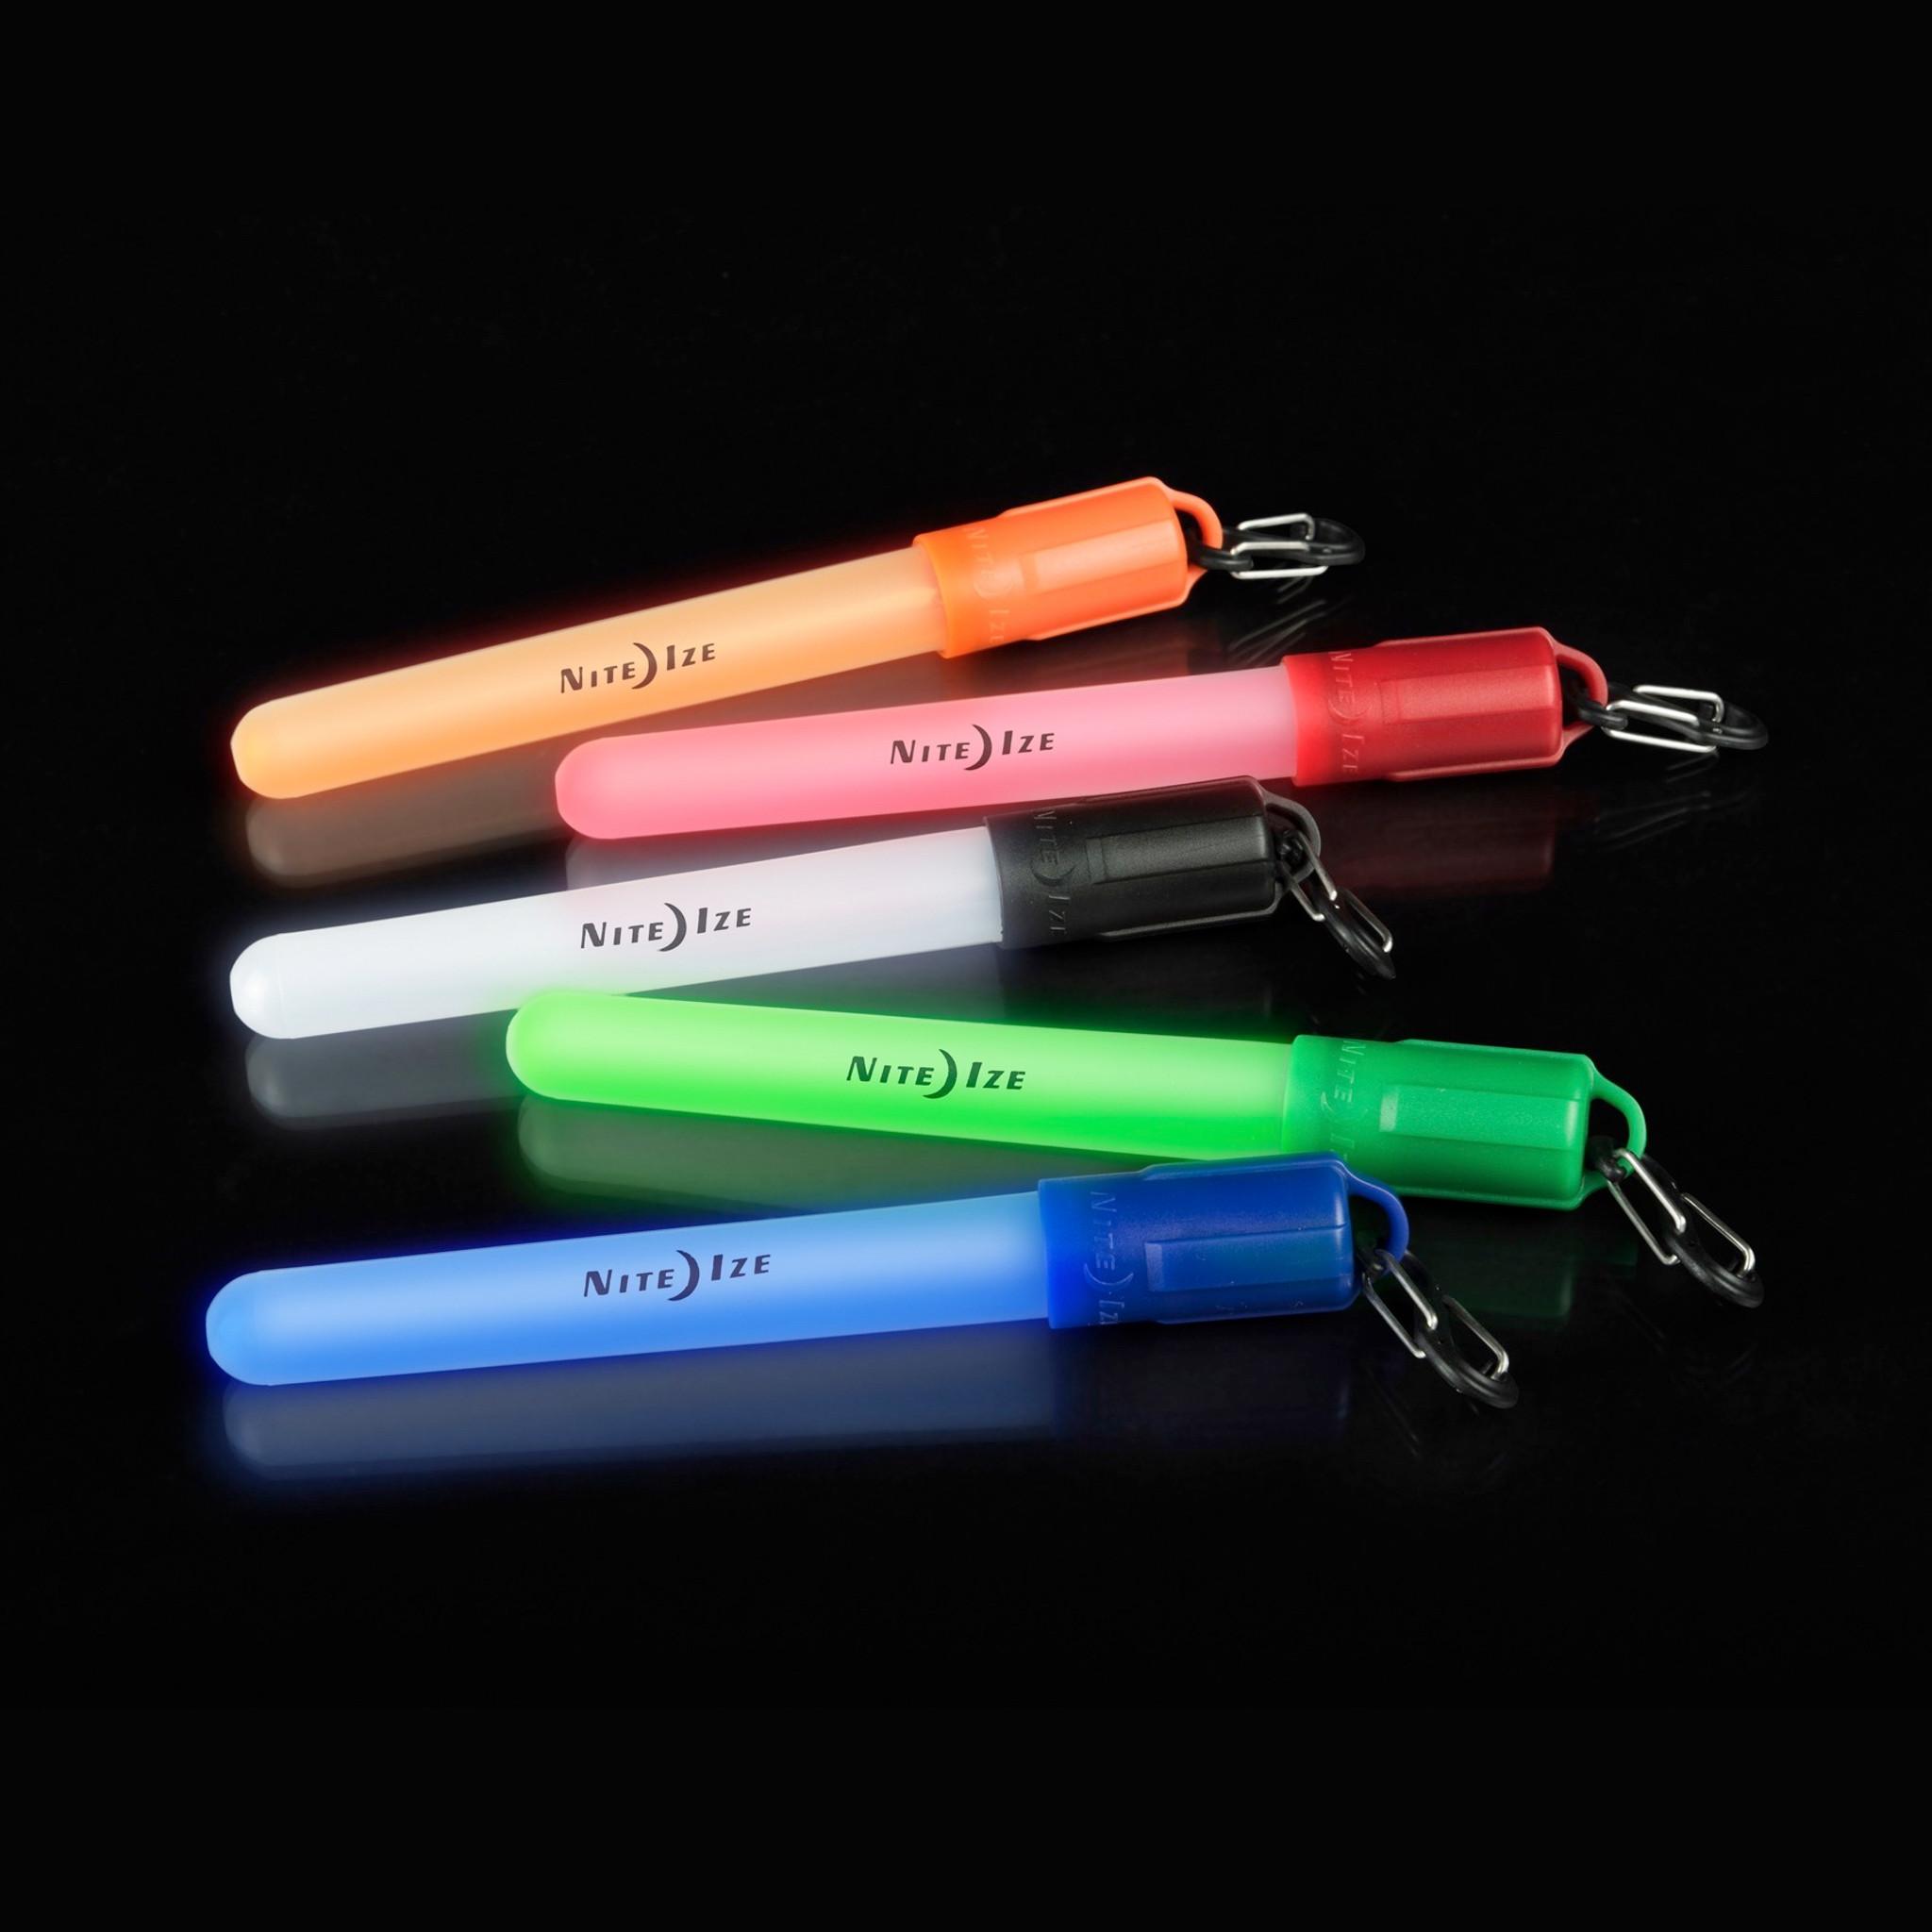 Nite Ize LED Mini Glowstick Waterproof Lightstick Safety Light Four colors